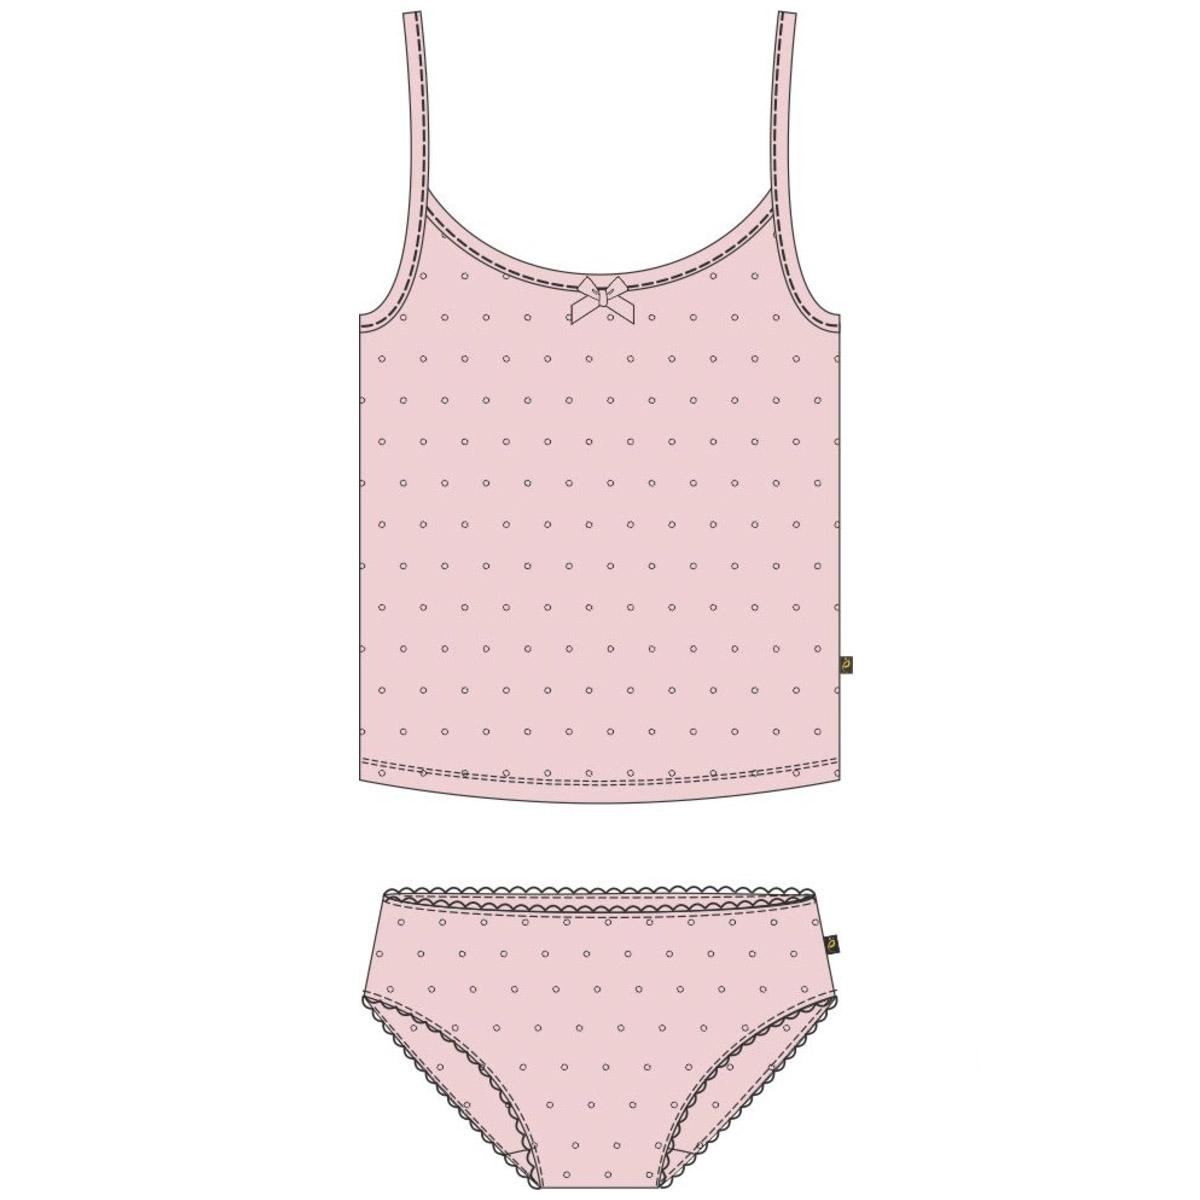 Комплект Ёмаё майка и трусы (33-101) рост 98 розовый<br>